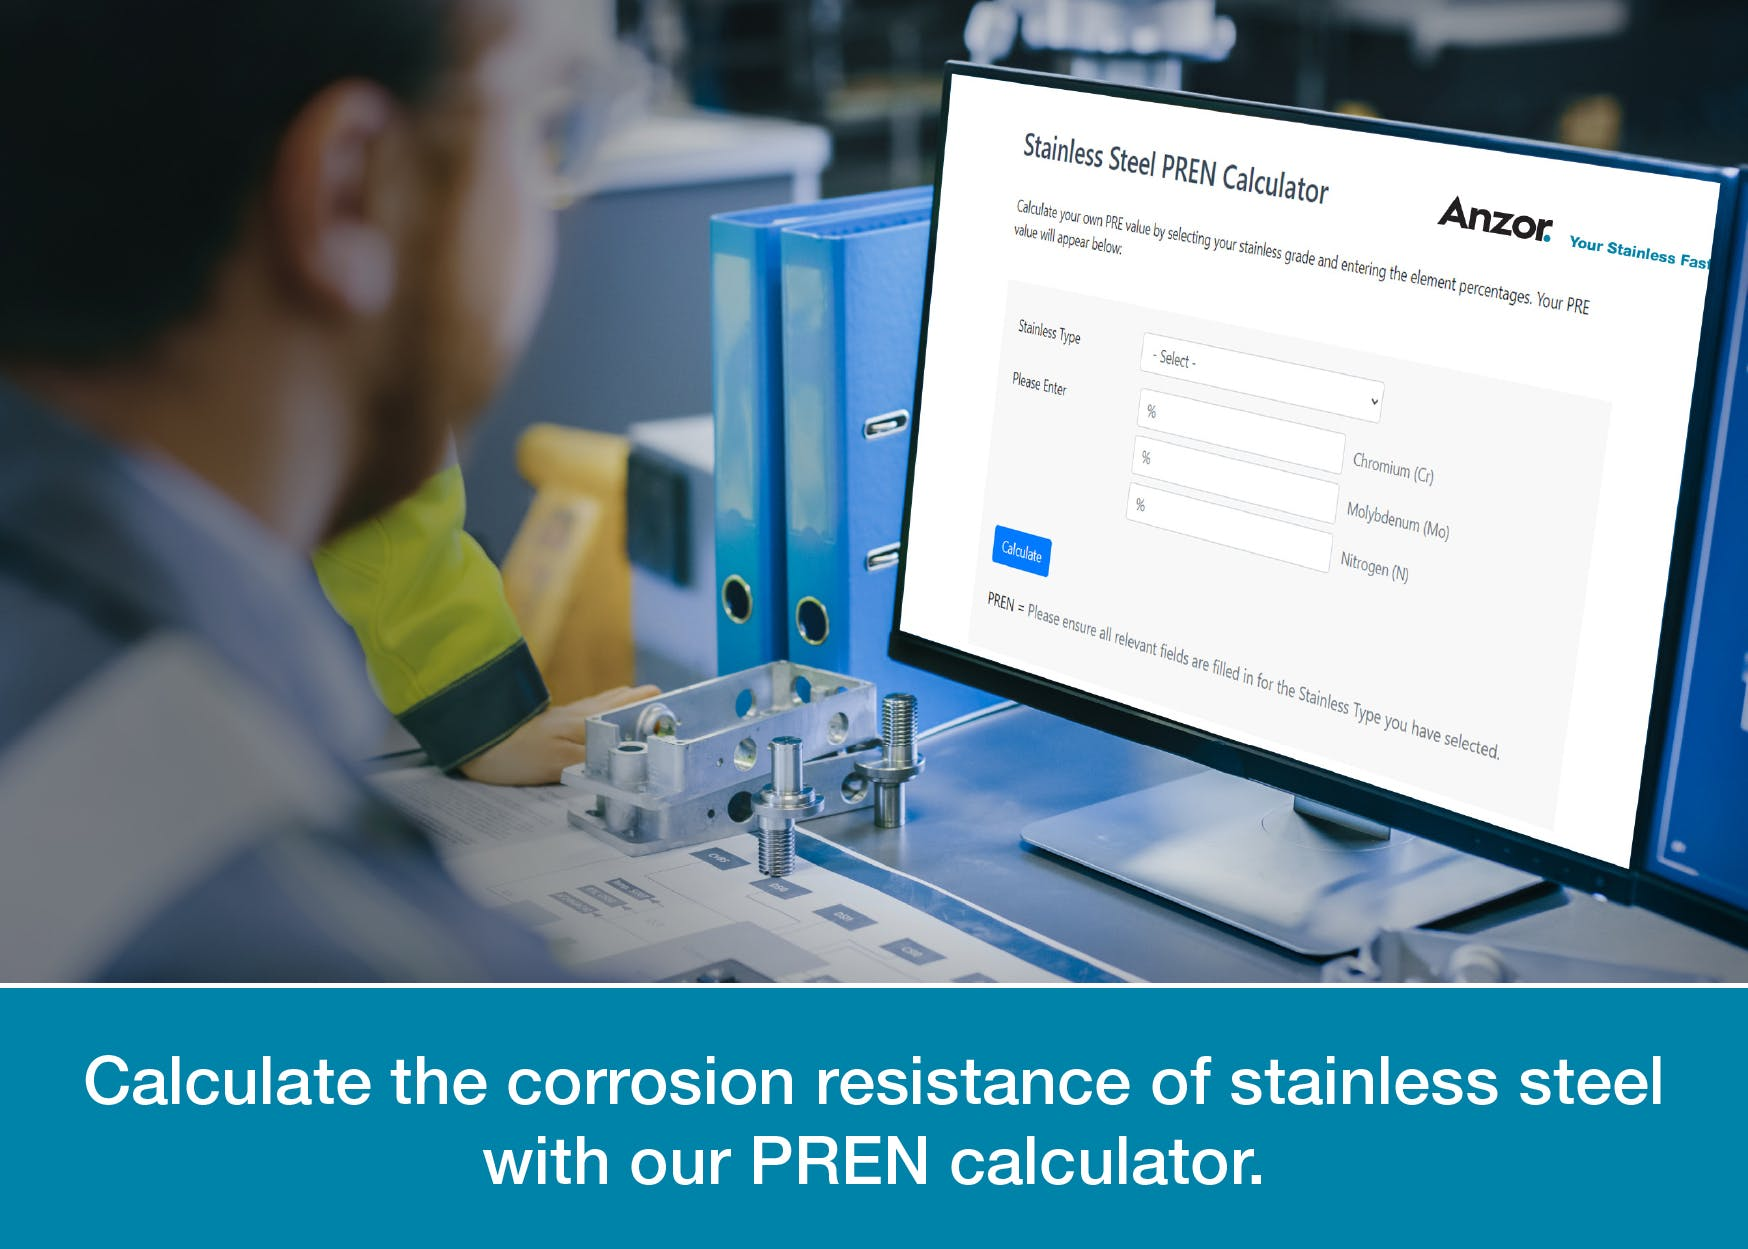 PREN Corrosion Calculator for Stainless Steel